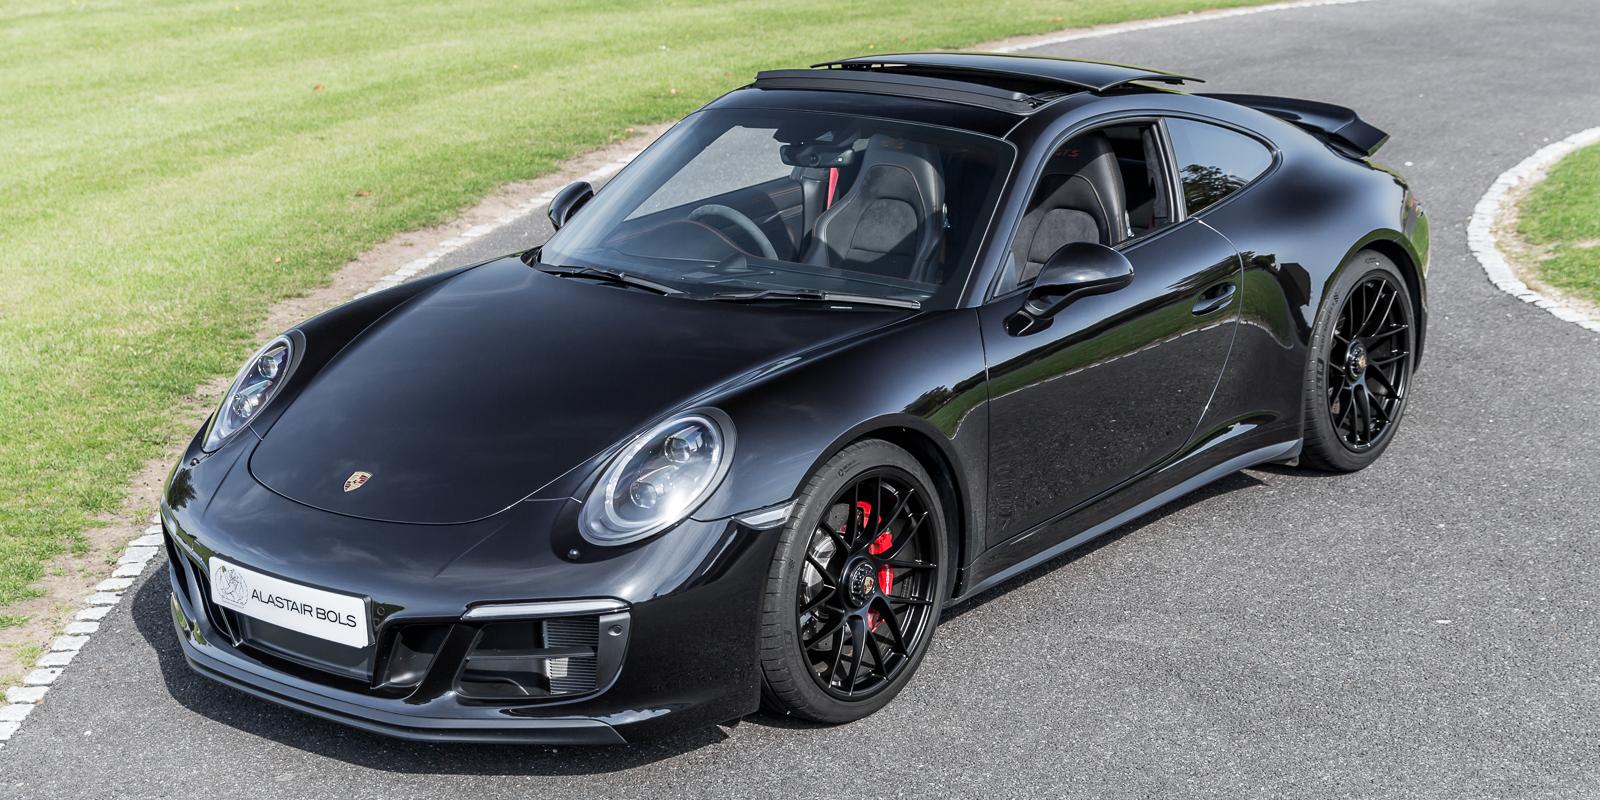 Porsche 991.2 GTS 4S – JET BLACK